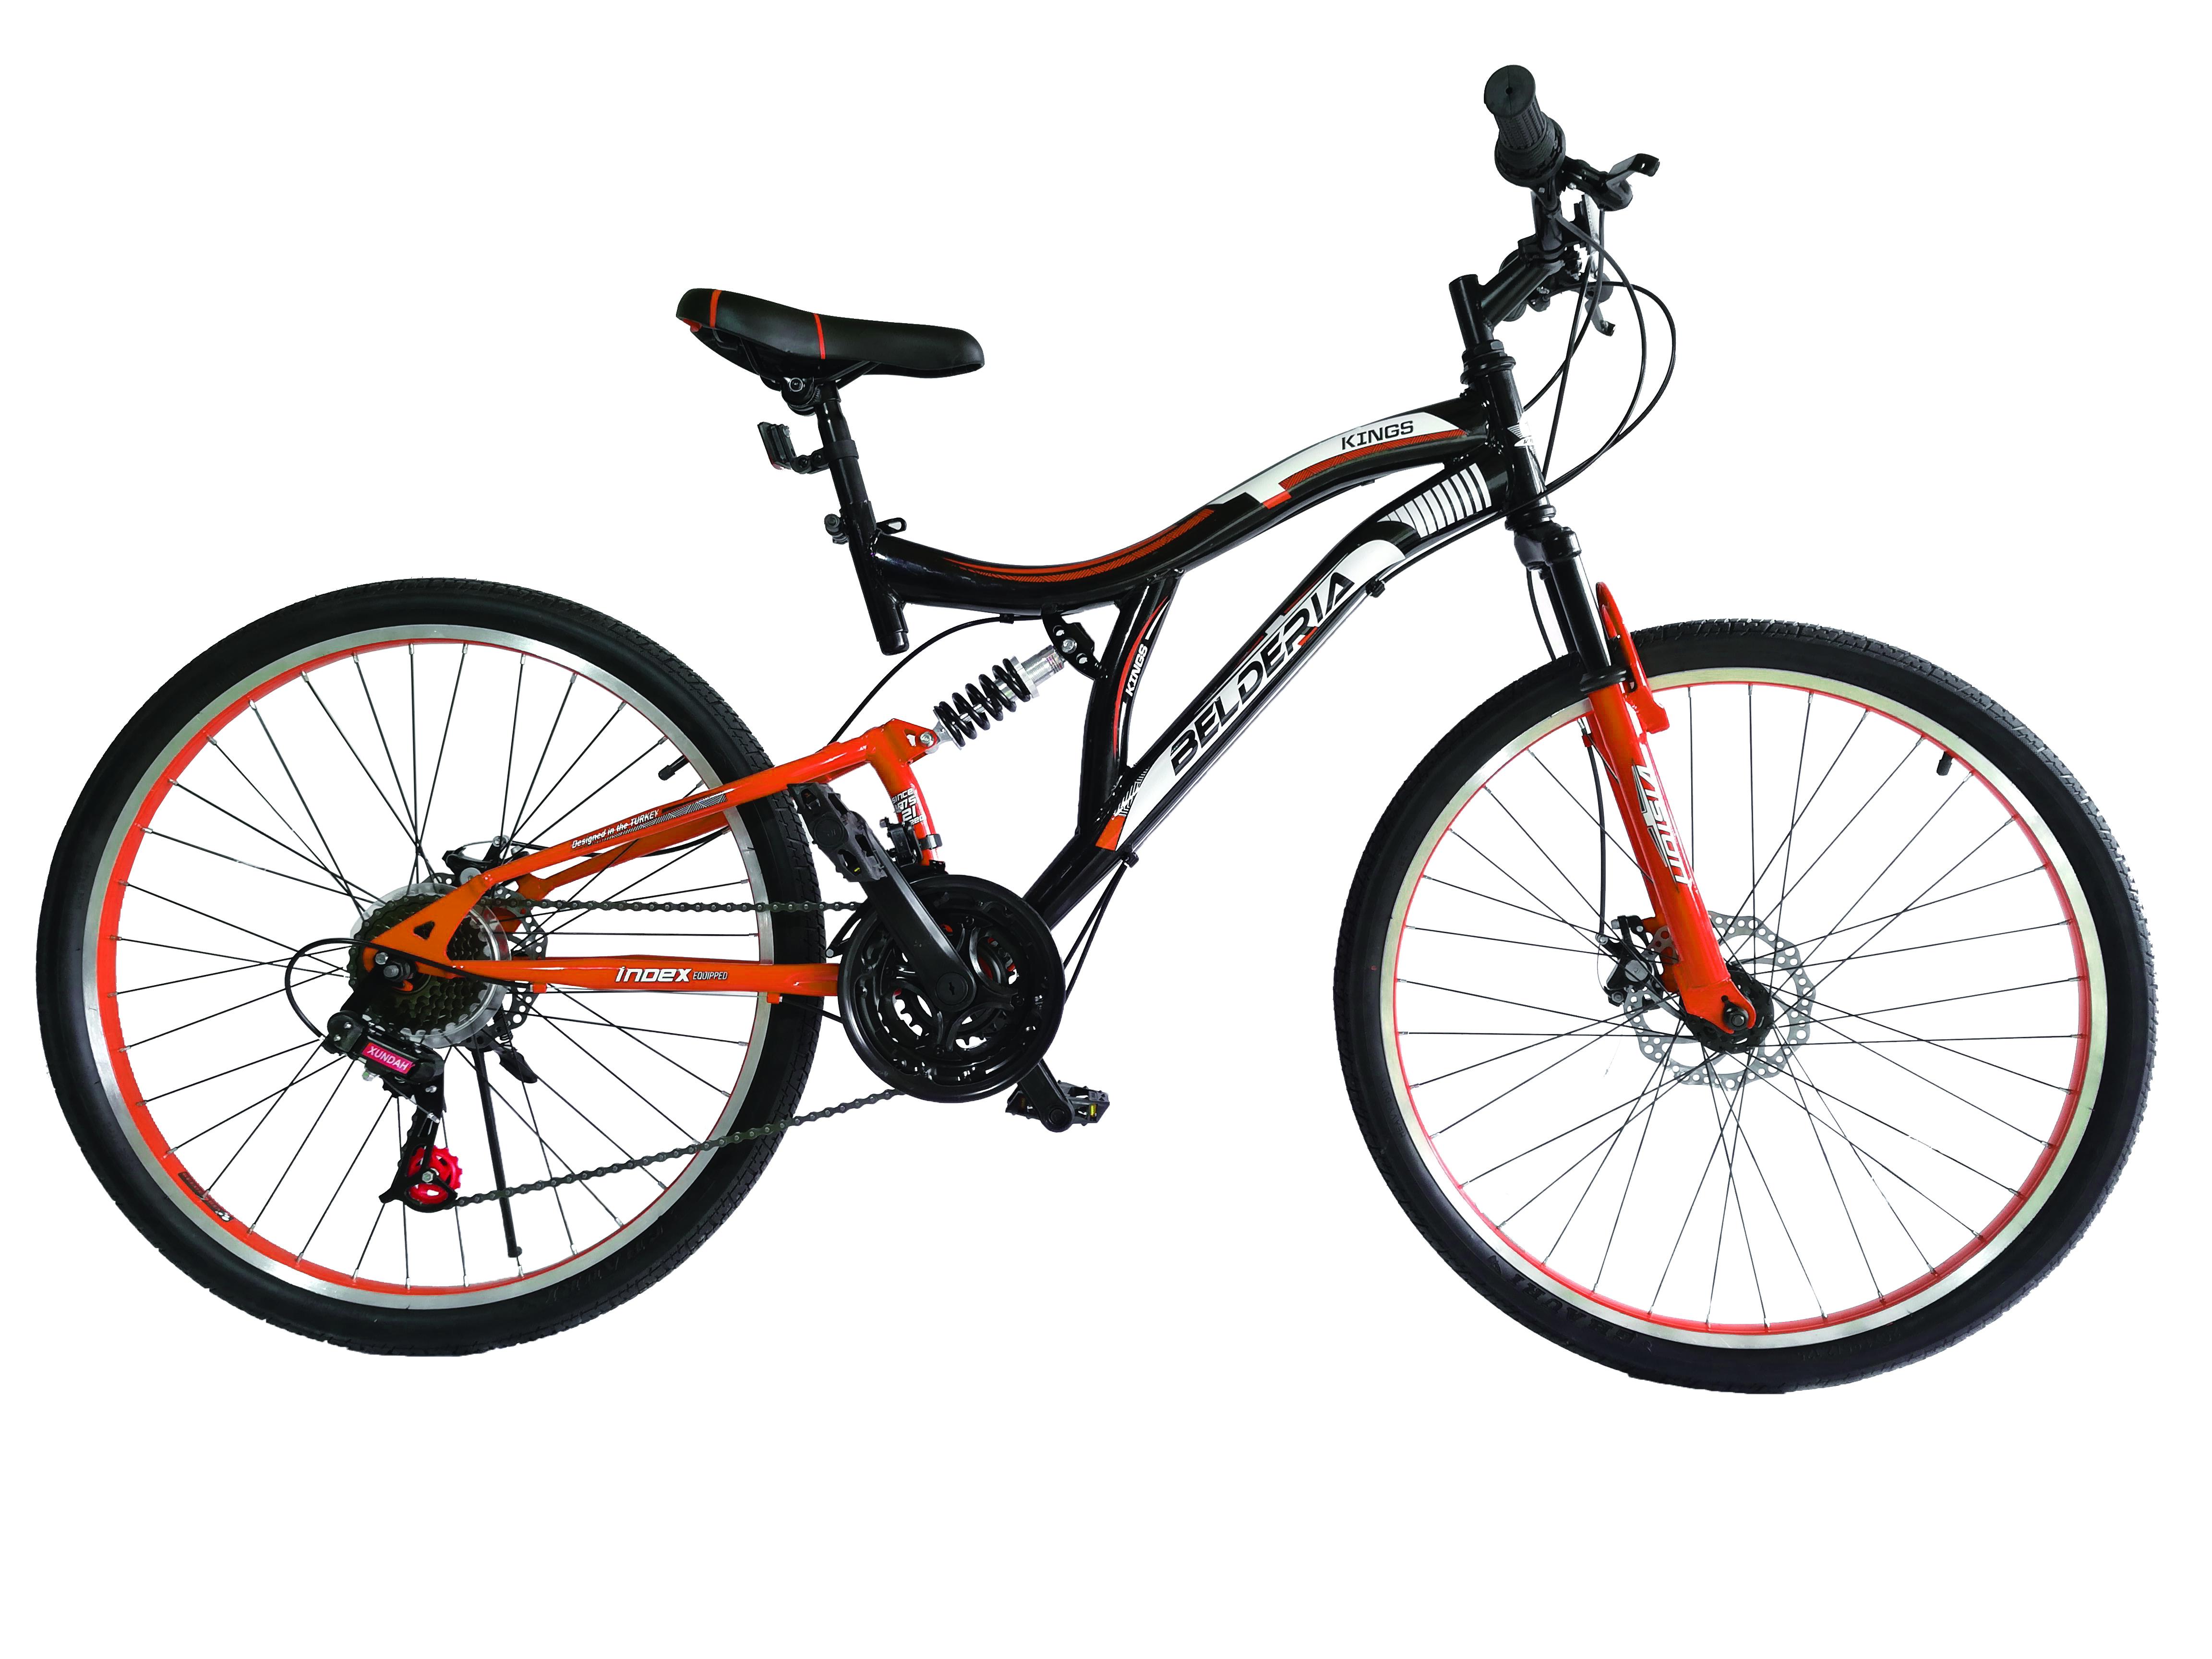 "Bicicleta MTB Full Suspensie Vision Kings 2D Culoare Negru/Alb Roata 26"" Otel [0]"